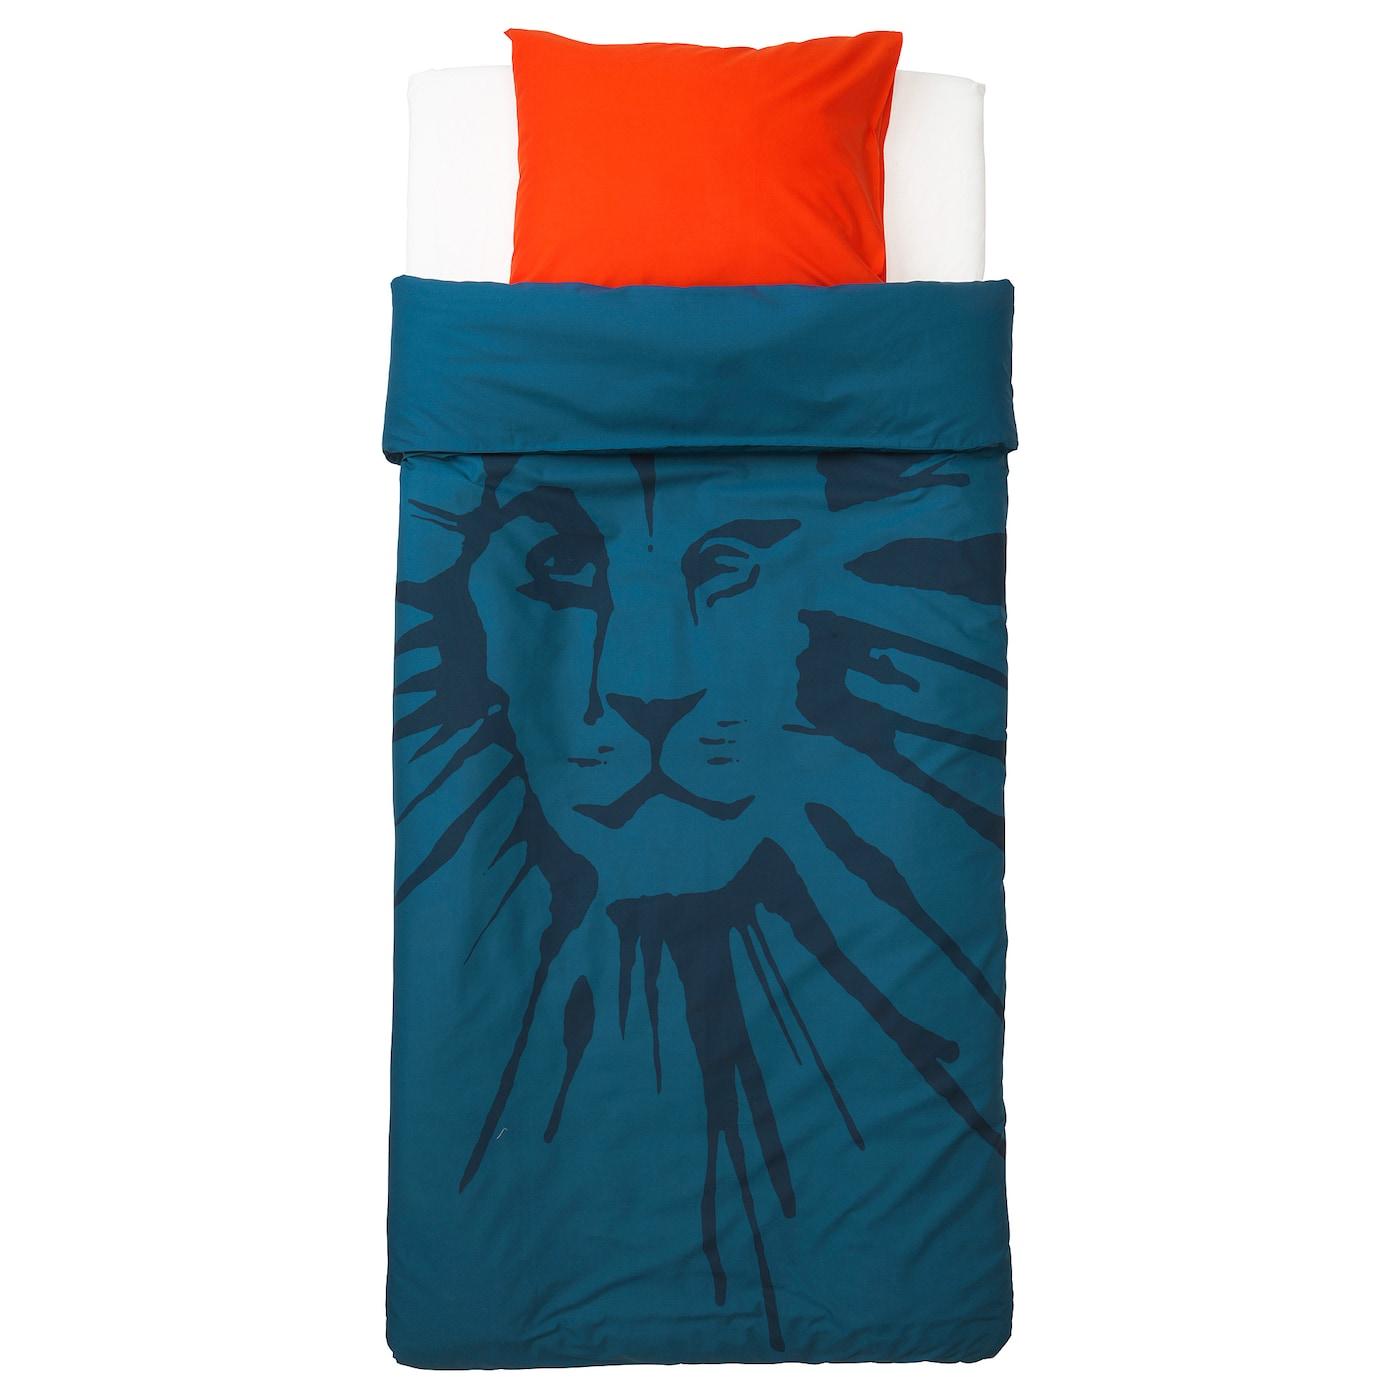 linge de lit textiles enfants 8 12 ans ikea. Black Bedroom Furniture Sets. Home Design Ideas